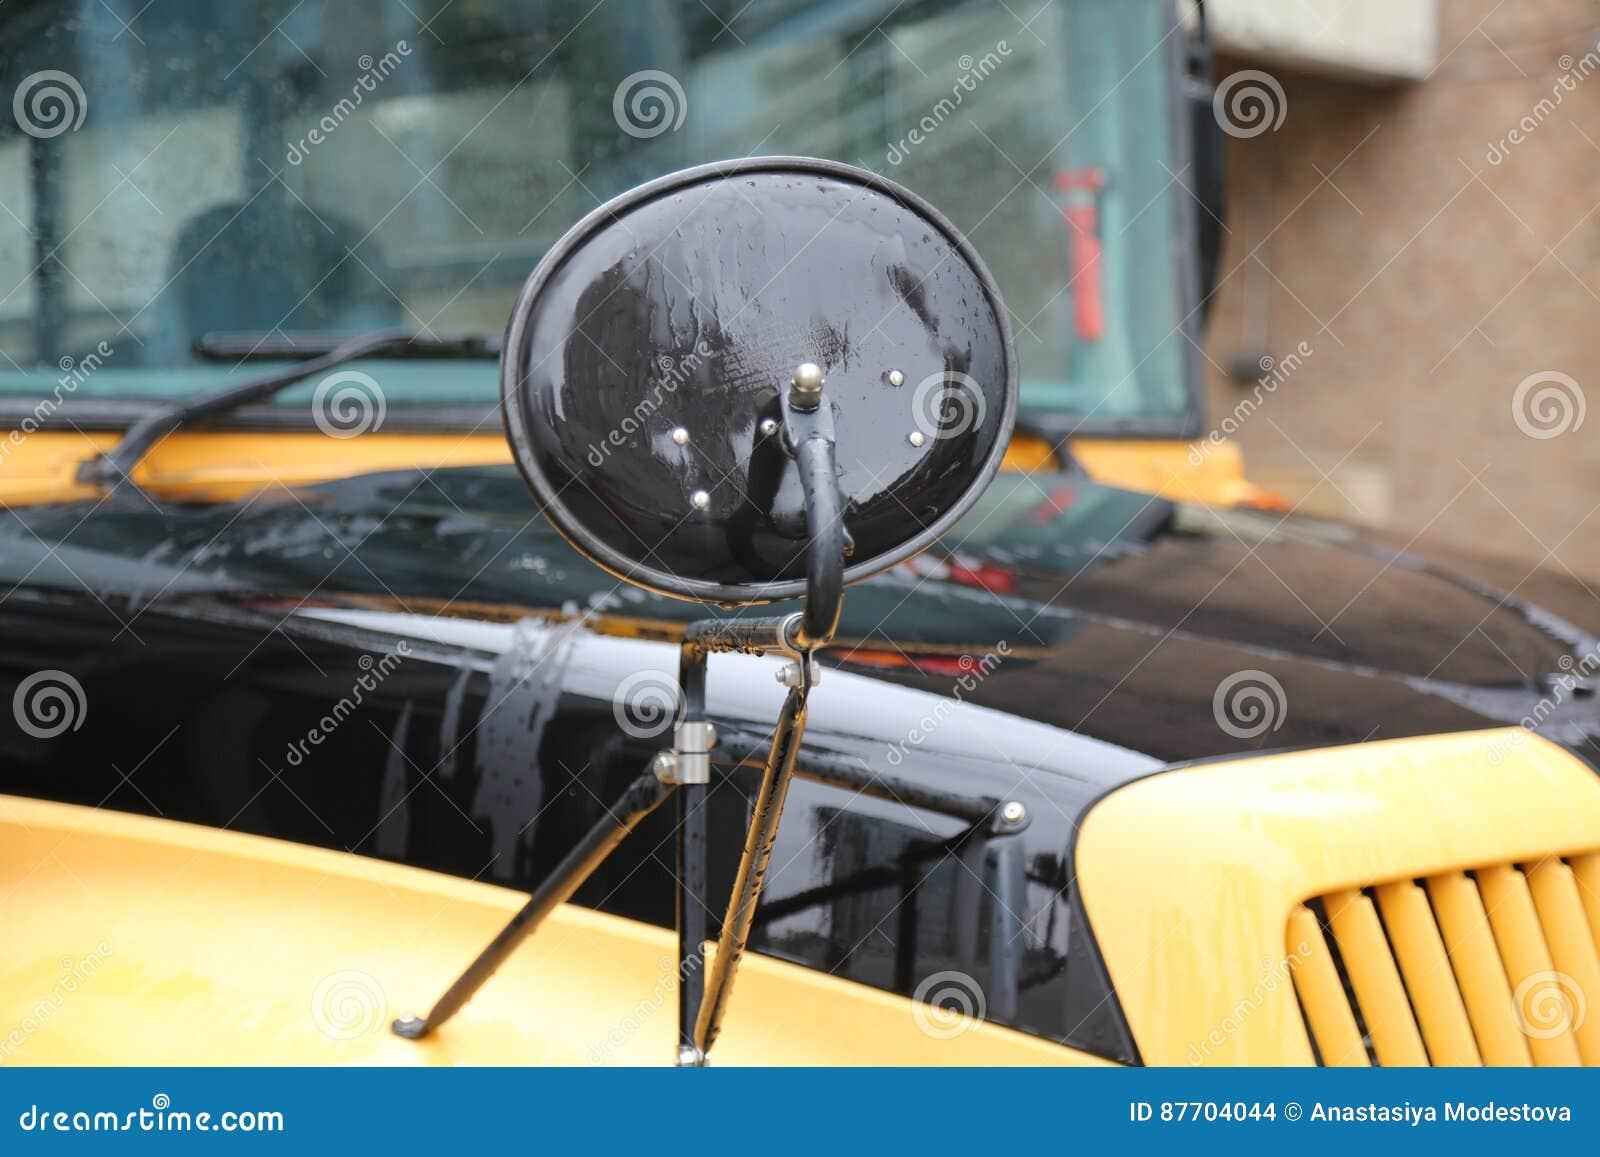 Autobus de scholl de morror de vue de côté